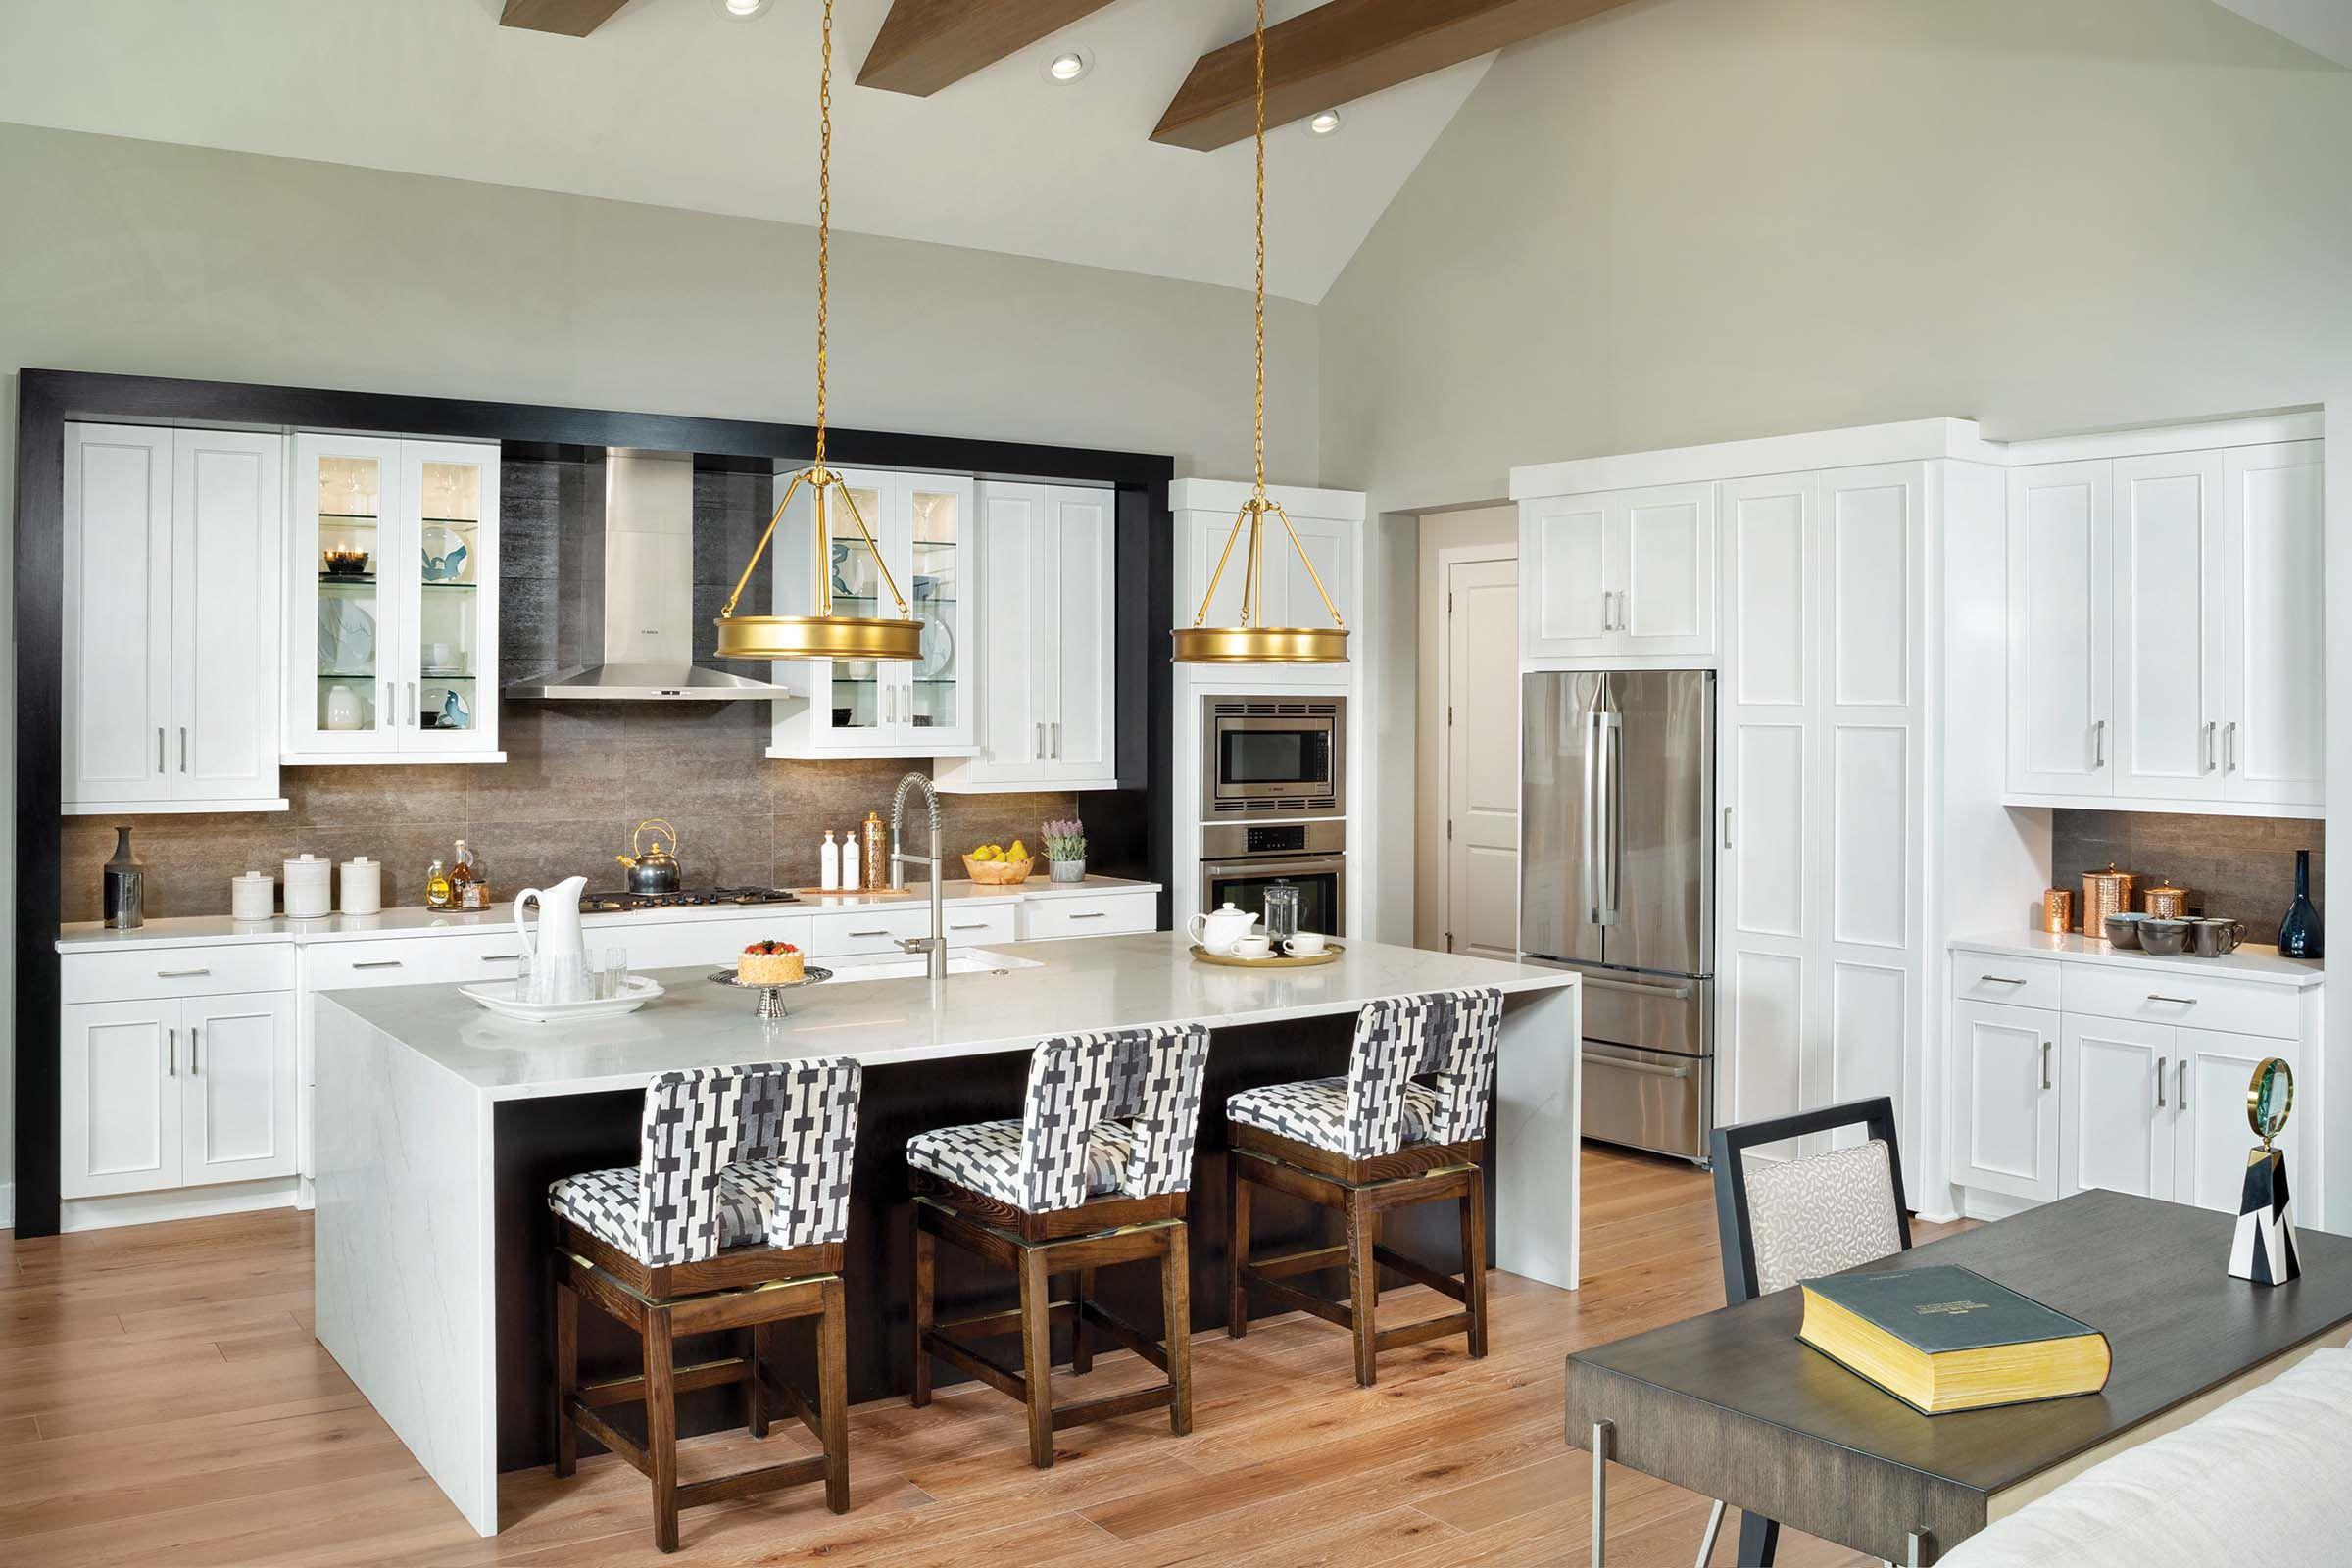 Aco Ar Homes Indy Home Kitchen Design Trends Latest Kitchen Designs